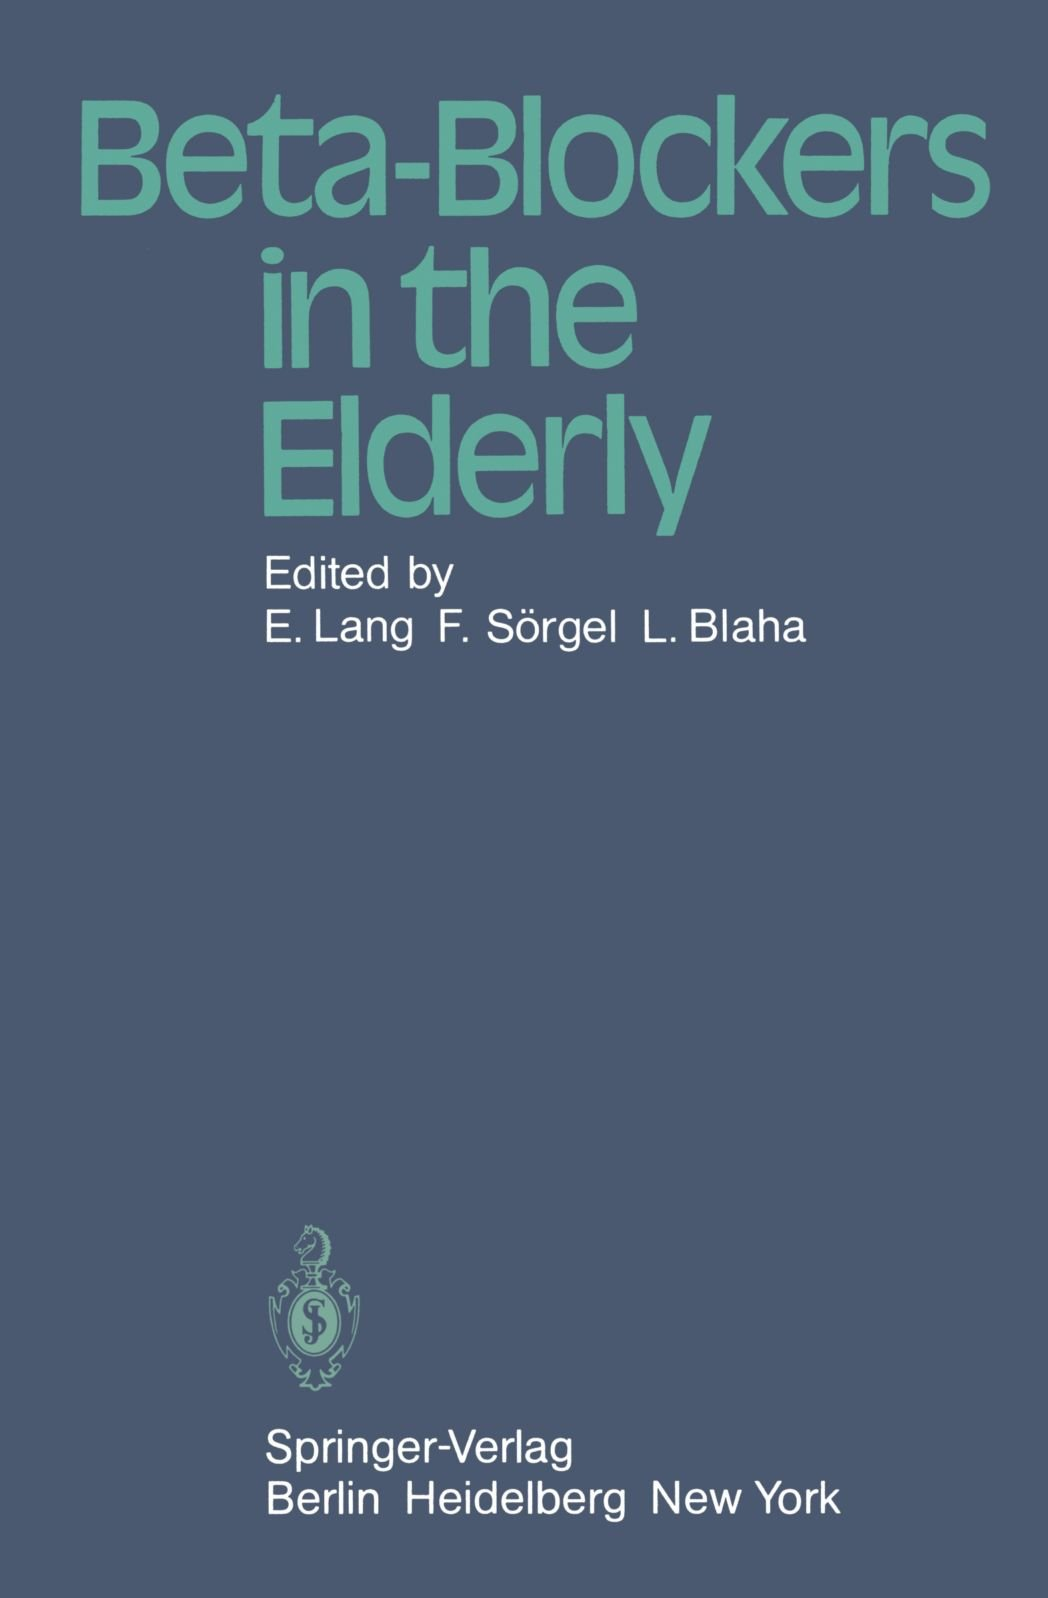 Beta-Blockers in the Elderly